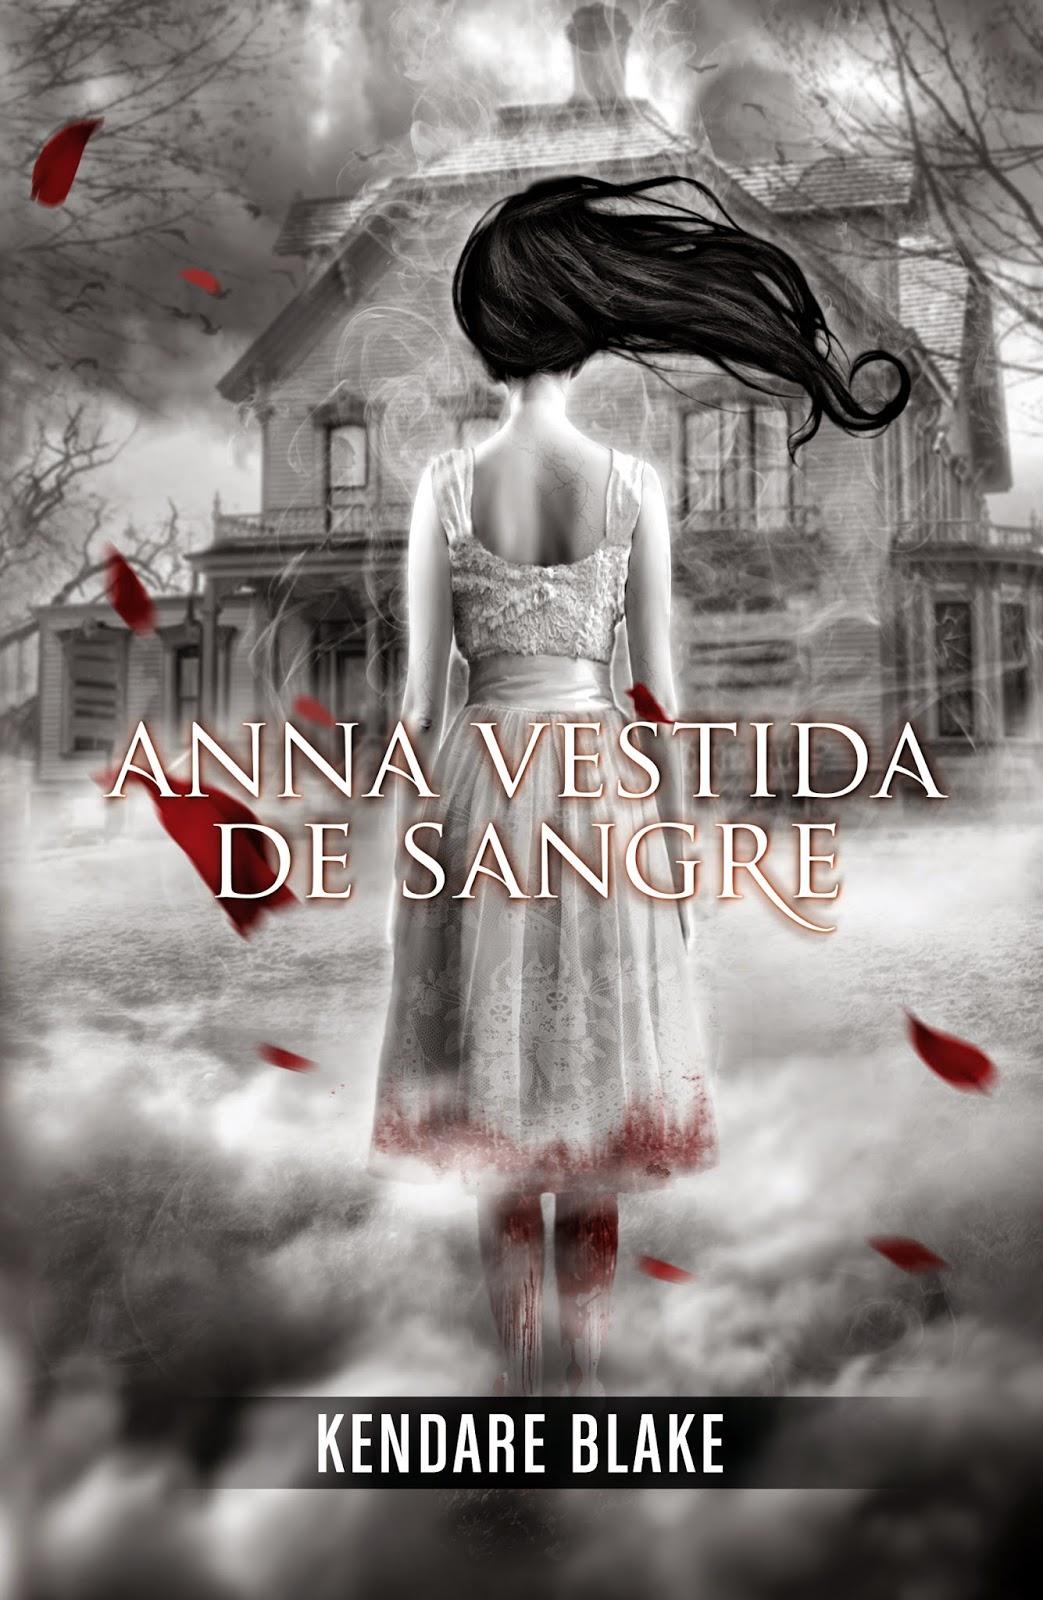 http://labibliotecadebella.blogspot.com.es/2015/02/kendare-blake-anna-vestida-de-sangre.html